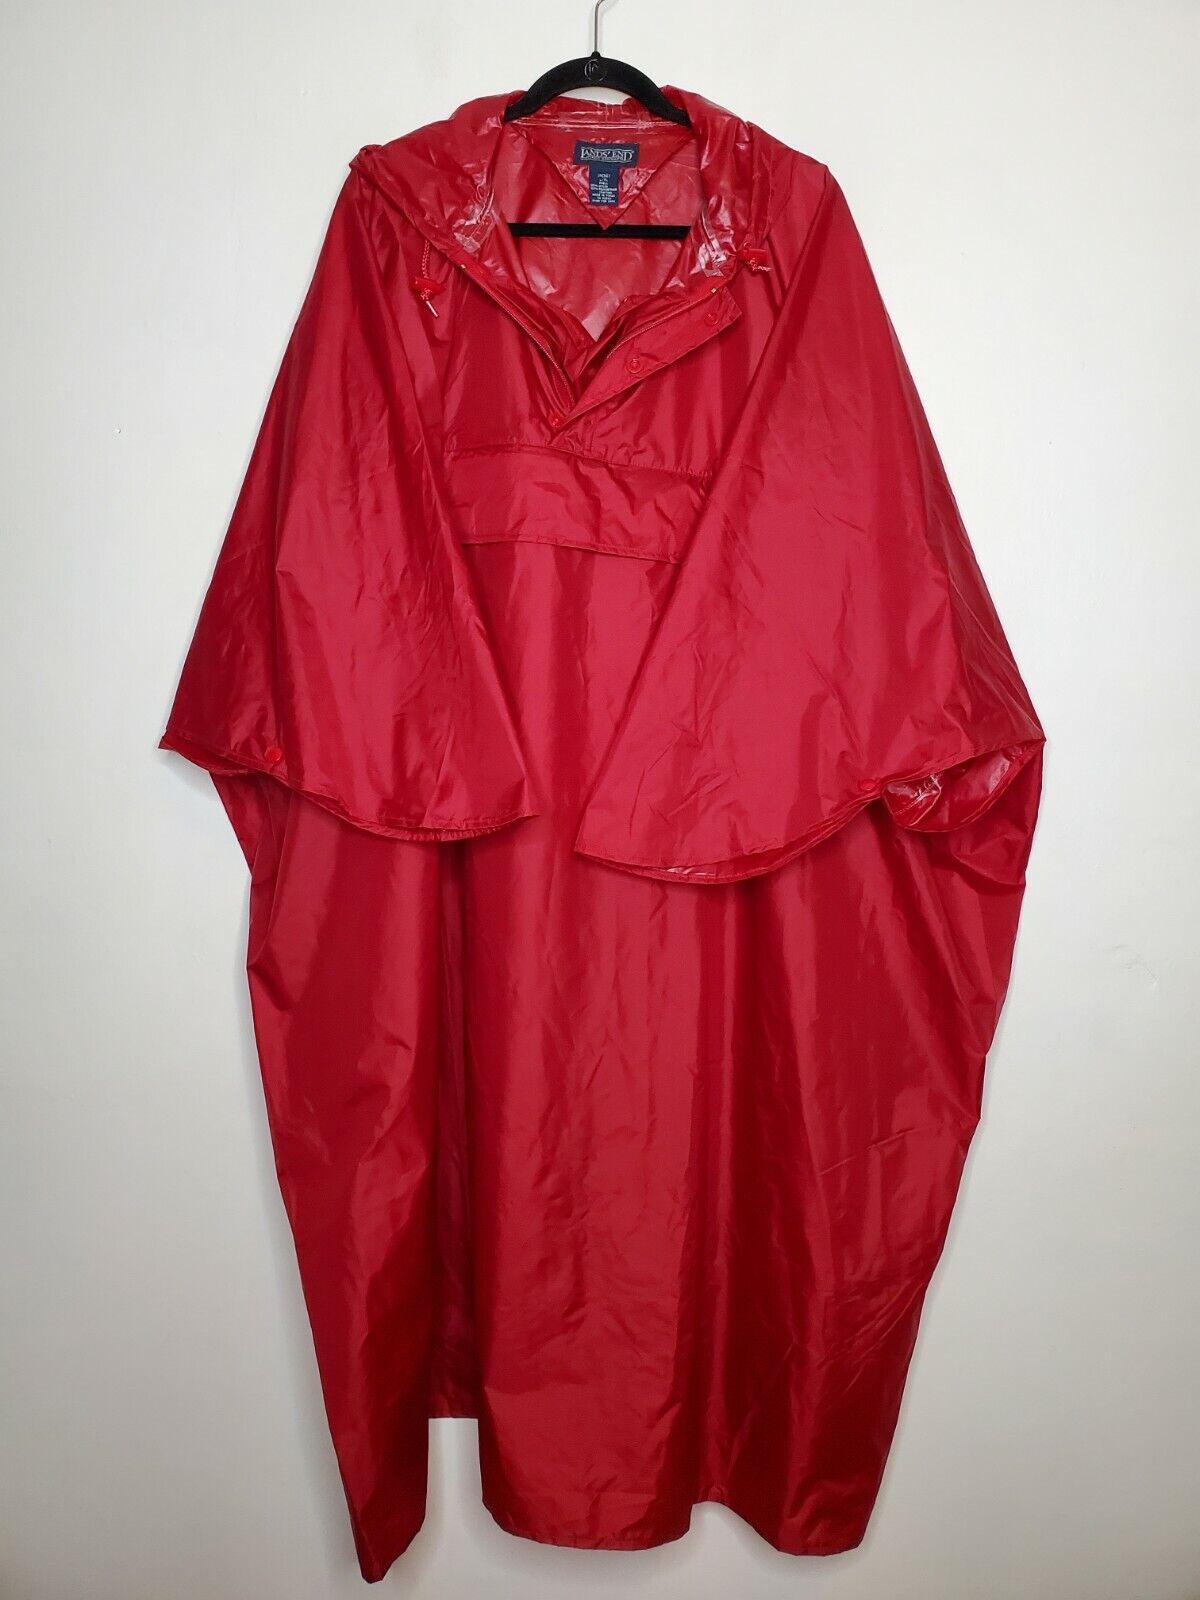 Lands End XL Deep Red Nylon Rain Gear Poncho unisex Underarm to underarm 36